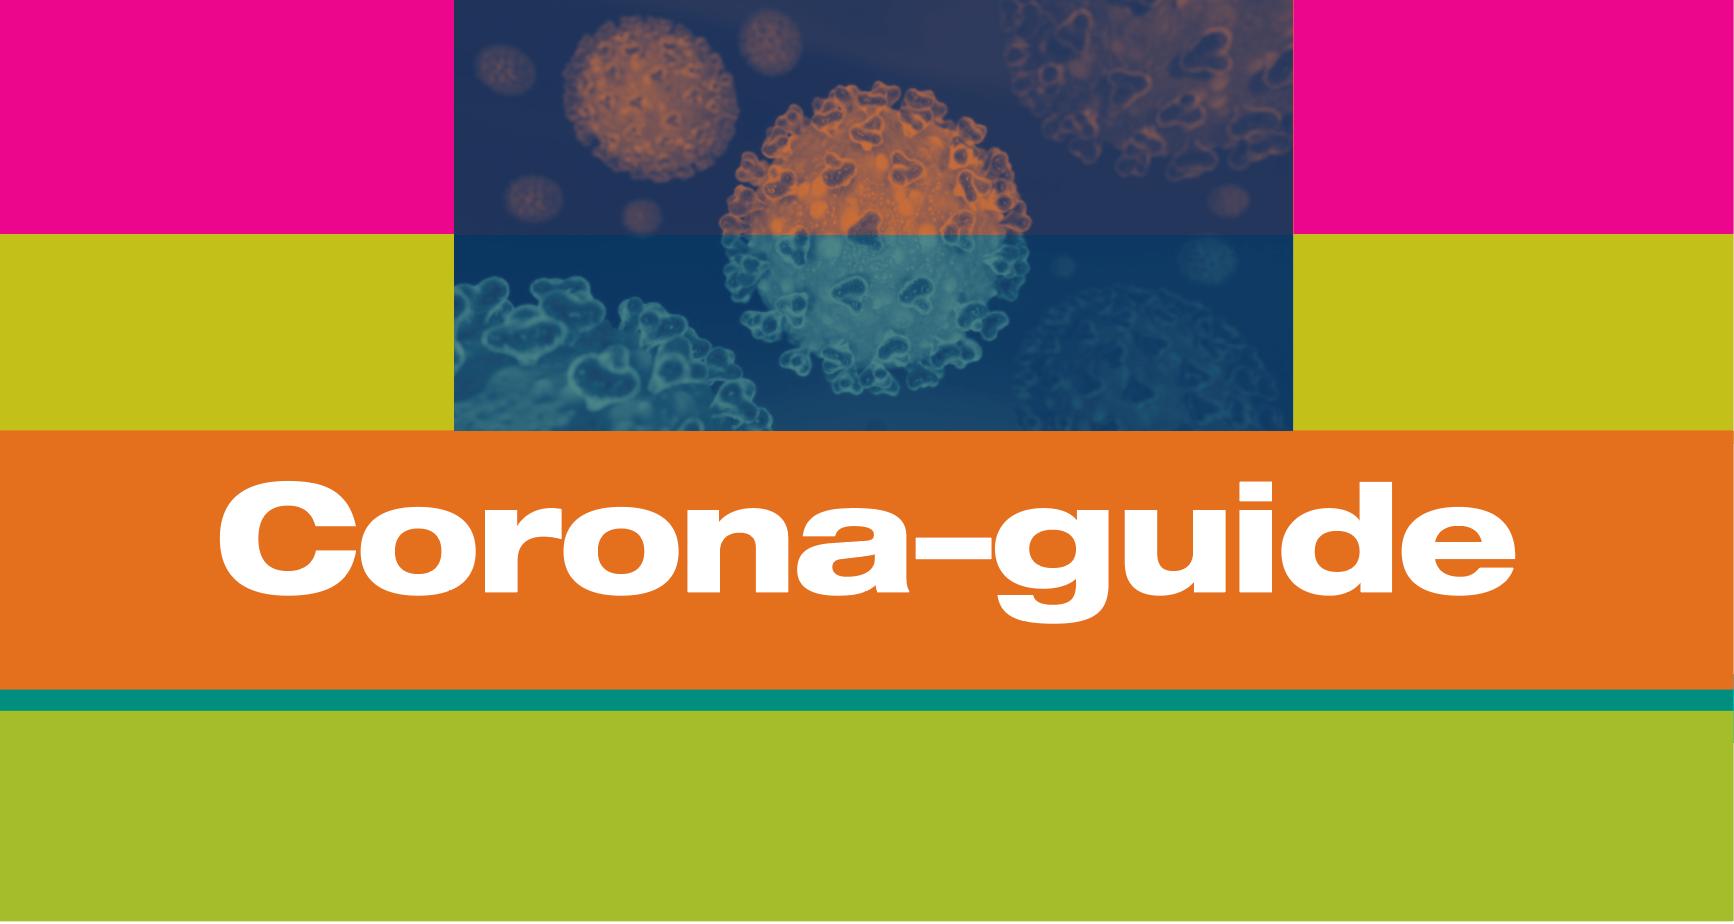 Corona-guide